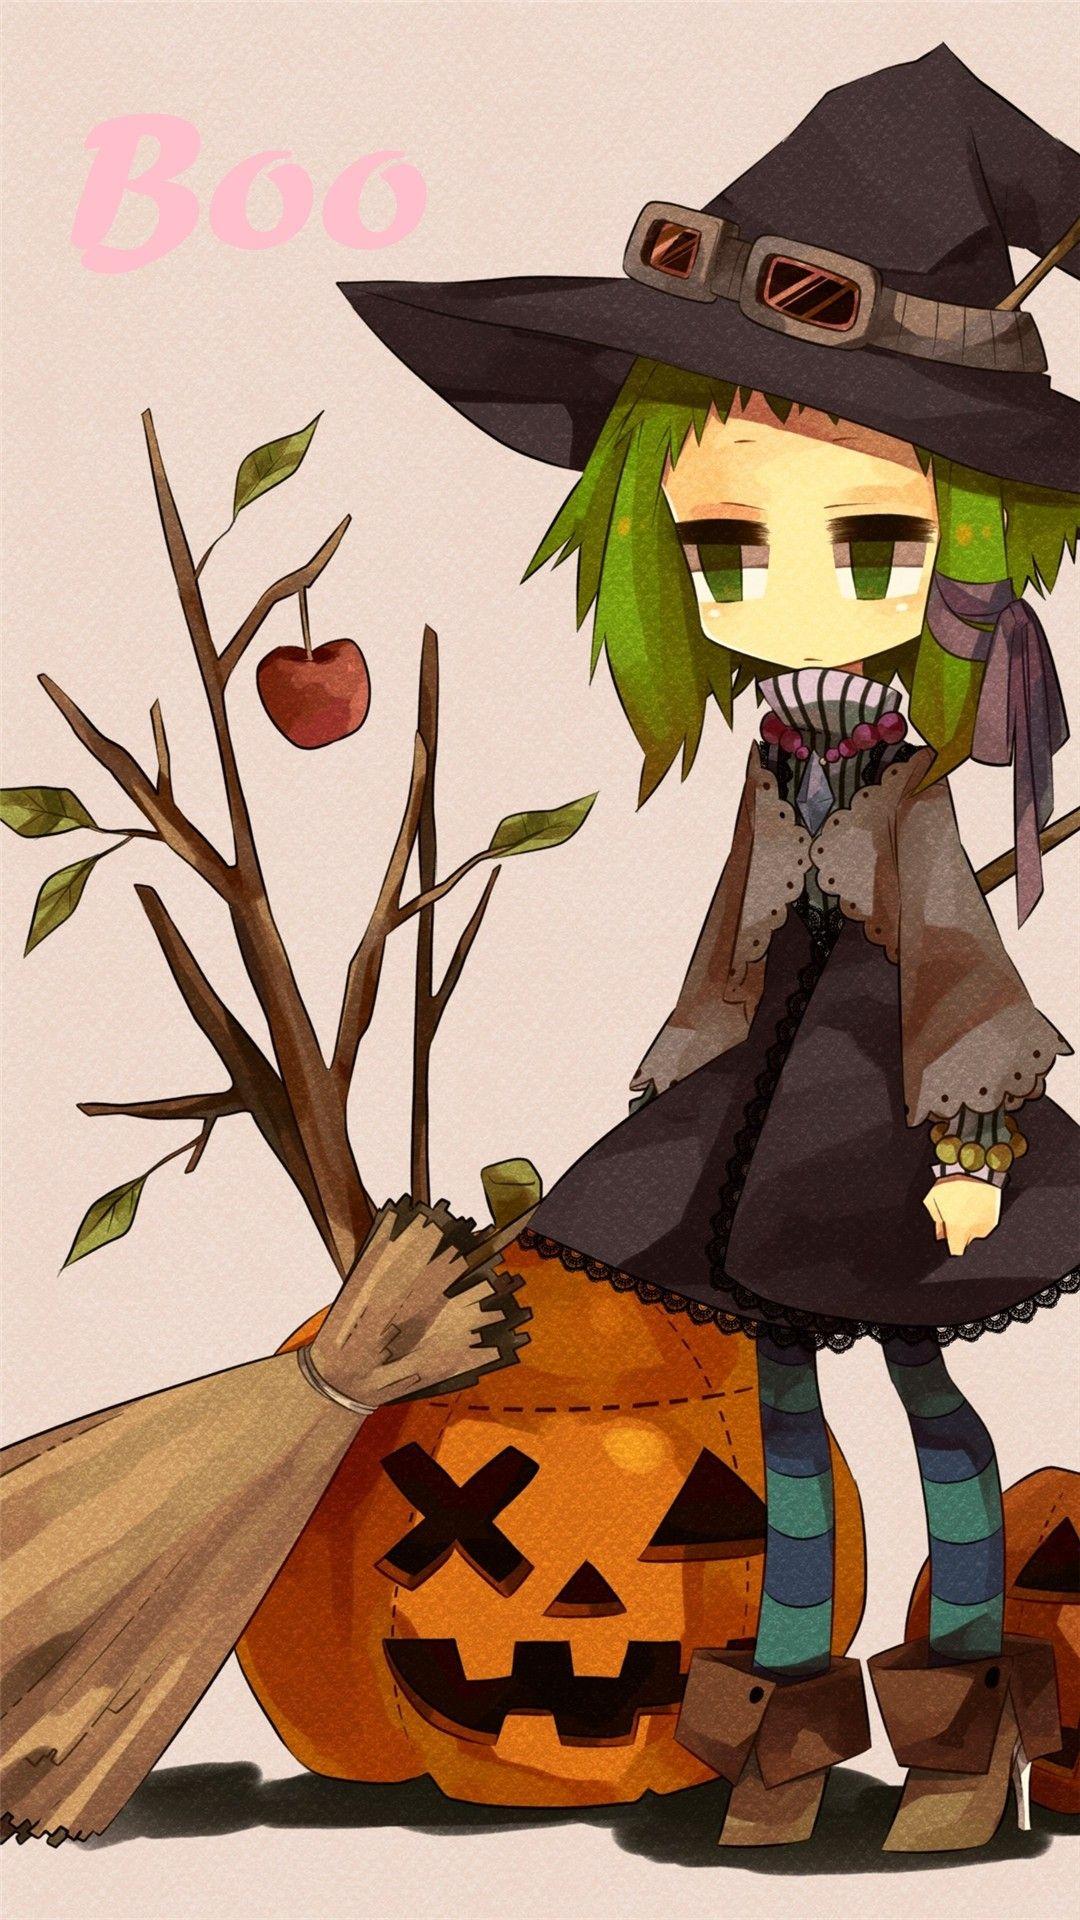 Good Wallpaper Halloween Pinterest - 4adf5489a840fdd6ab24c01258351419  You Should Have_98135.jpg